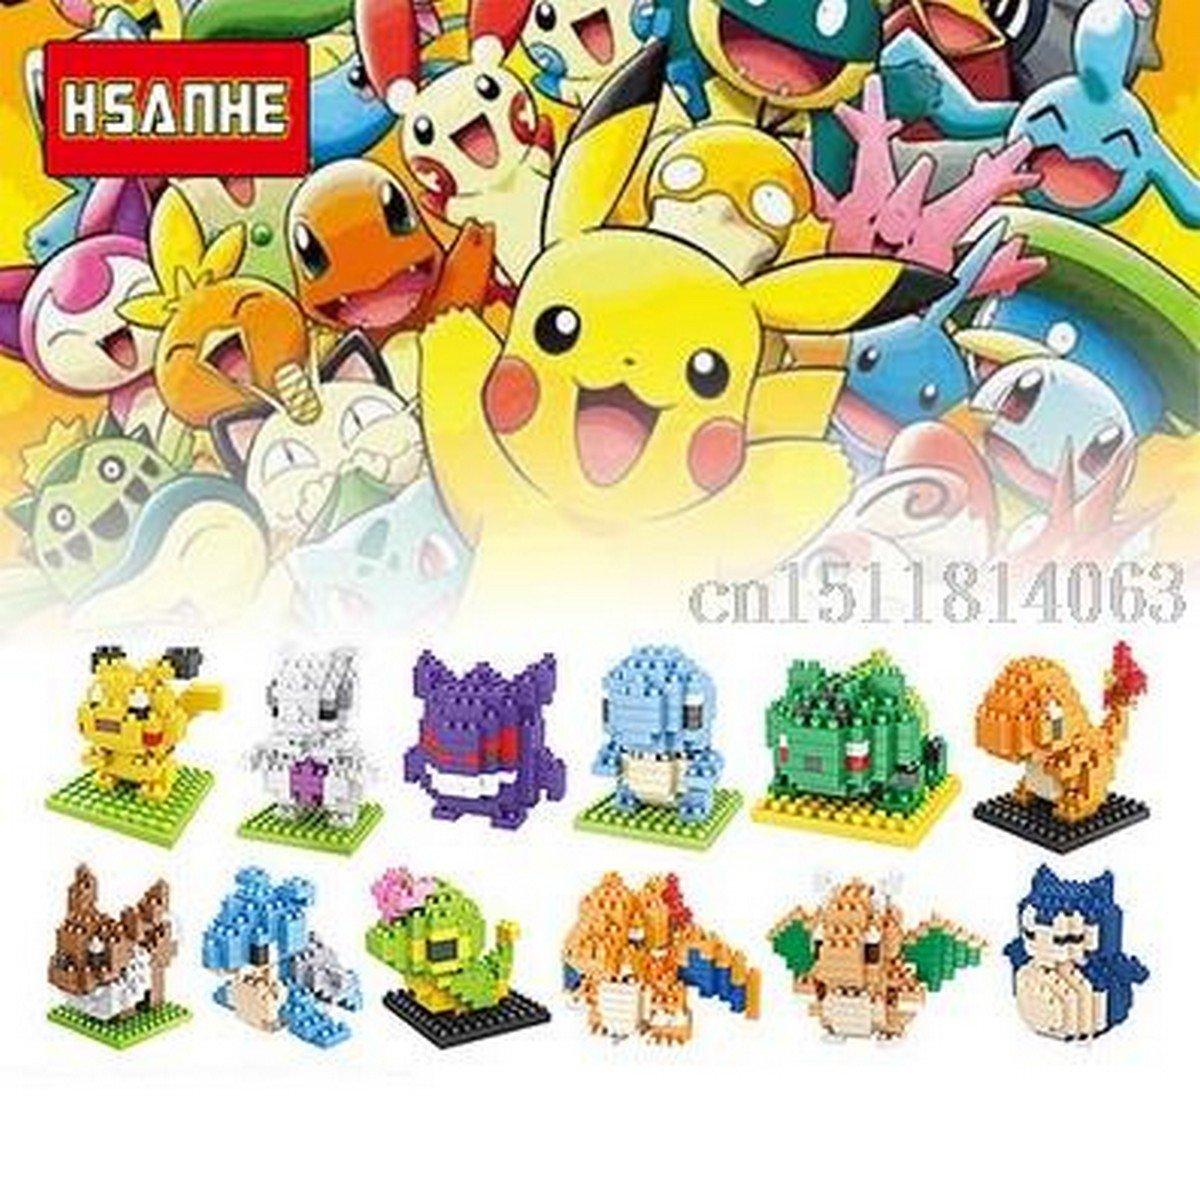 Buy 12Pcslot Pokemon Figures Model Toys Pikachu Firedragon Charmander Bulbasaur Squirtle Eevee Anim